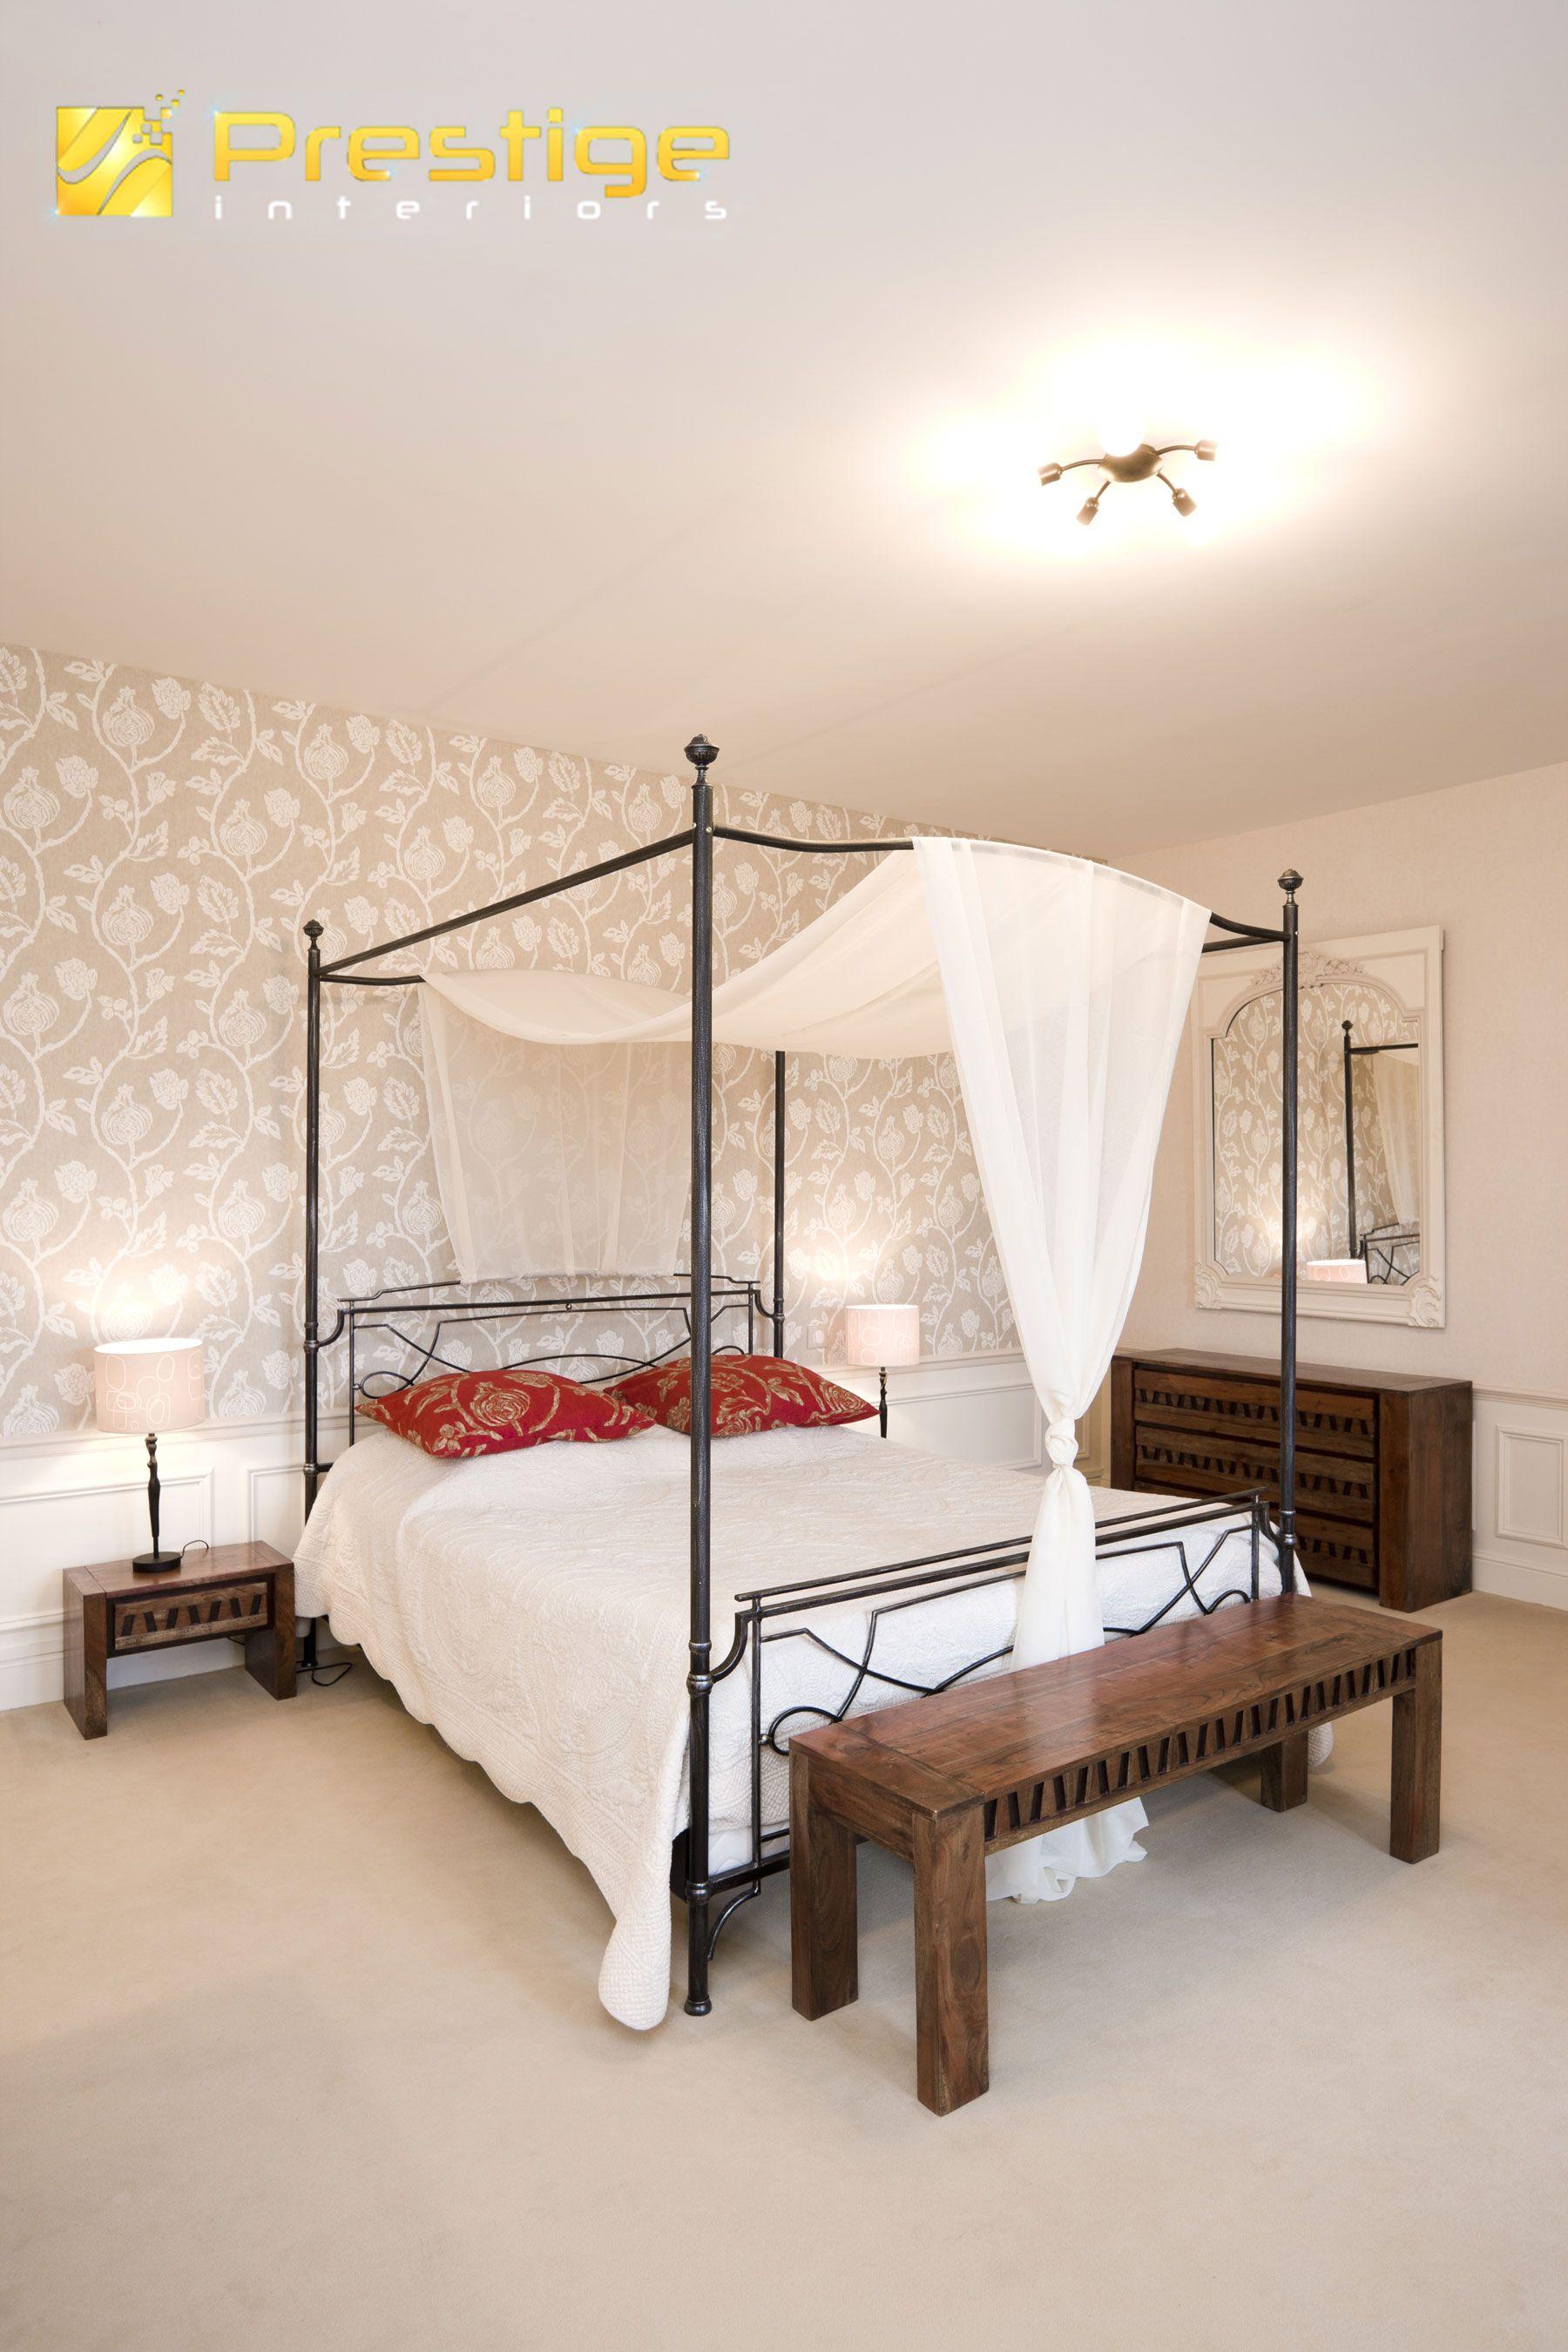 modern bedroom designs%0A Modern bedroom decorations  Prestige Interiors hyderbad  http   www prestigeinteriors in